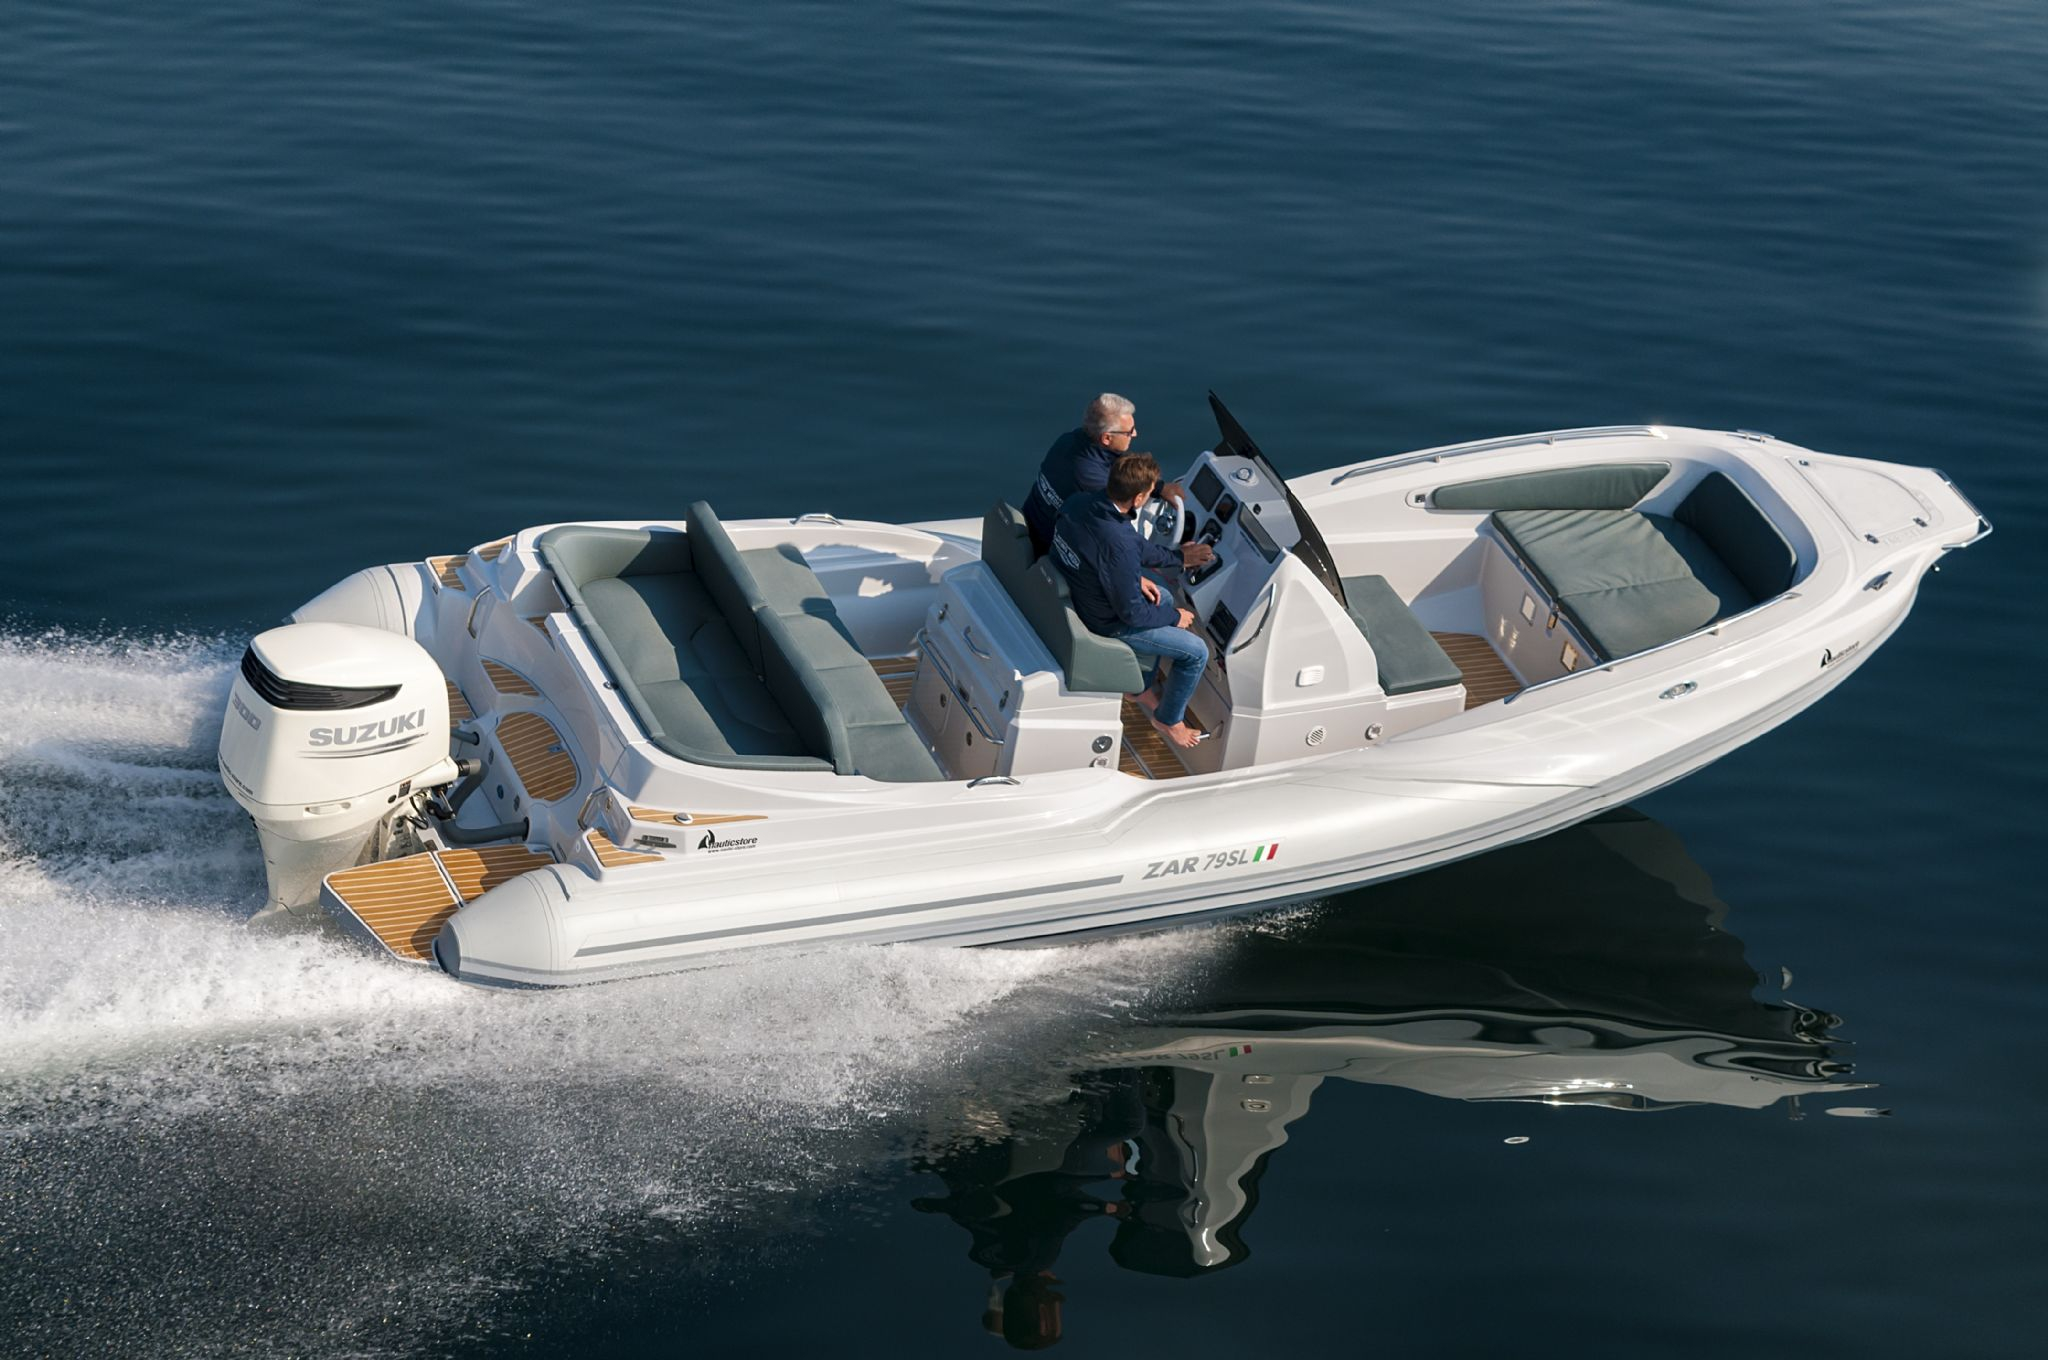 Zar 79 Sport Luxury-0